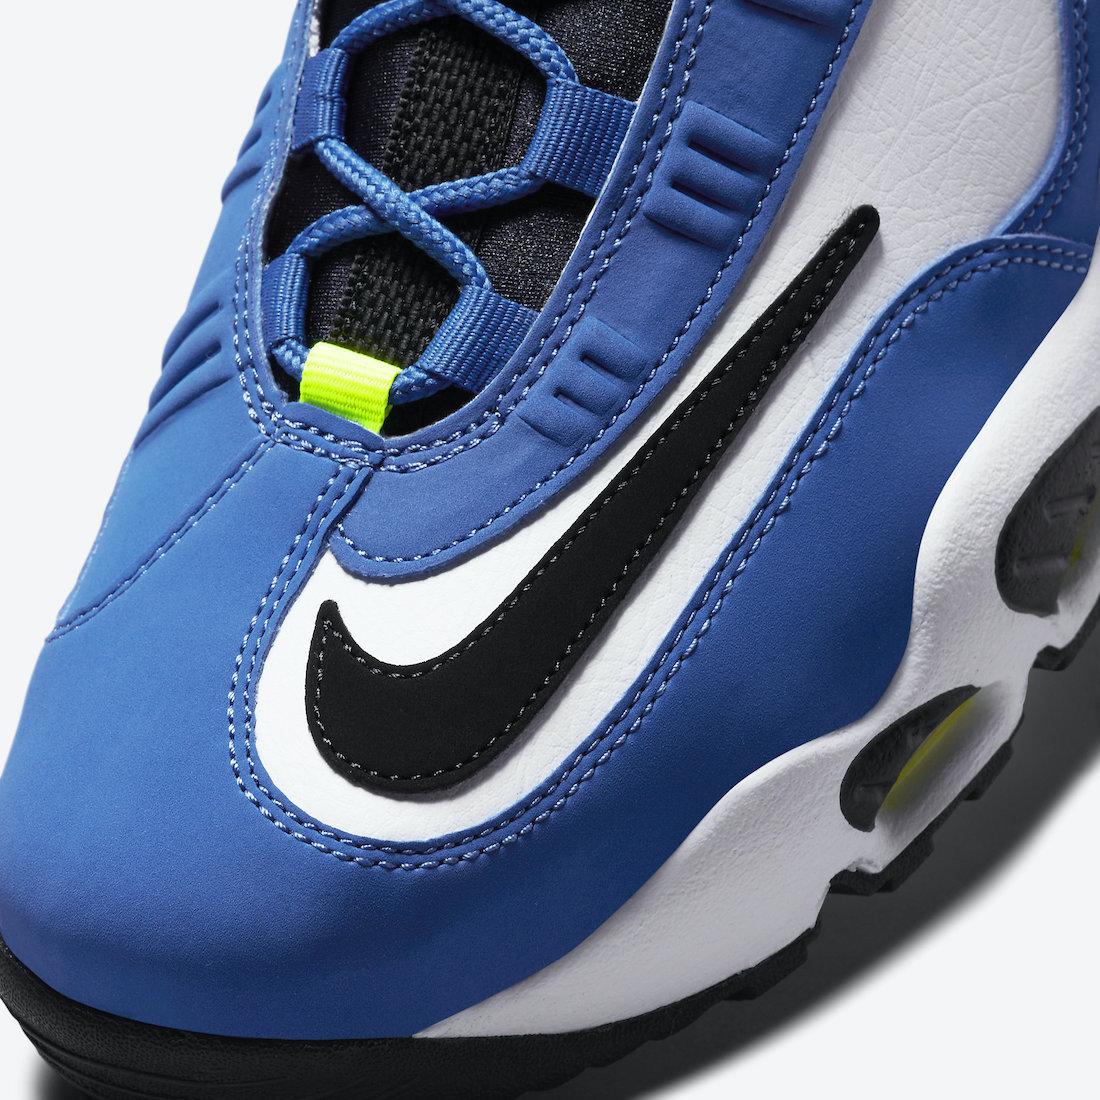 Nike,Air Griffey Max 1,发售, DJ5   25 周年庆!Air Griffey Max 1 经典配色即将复刻!